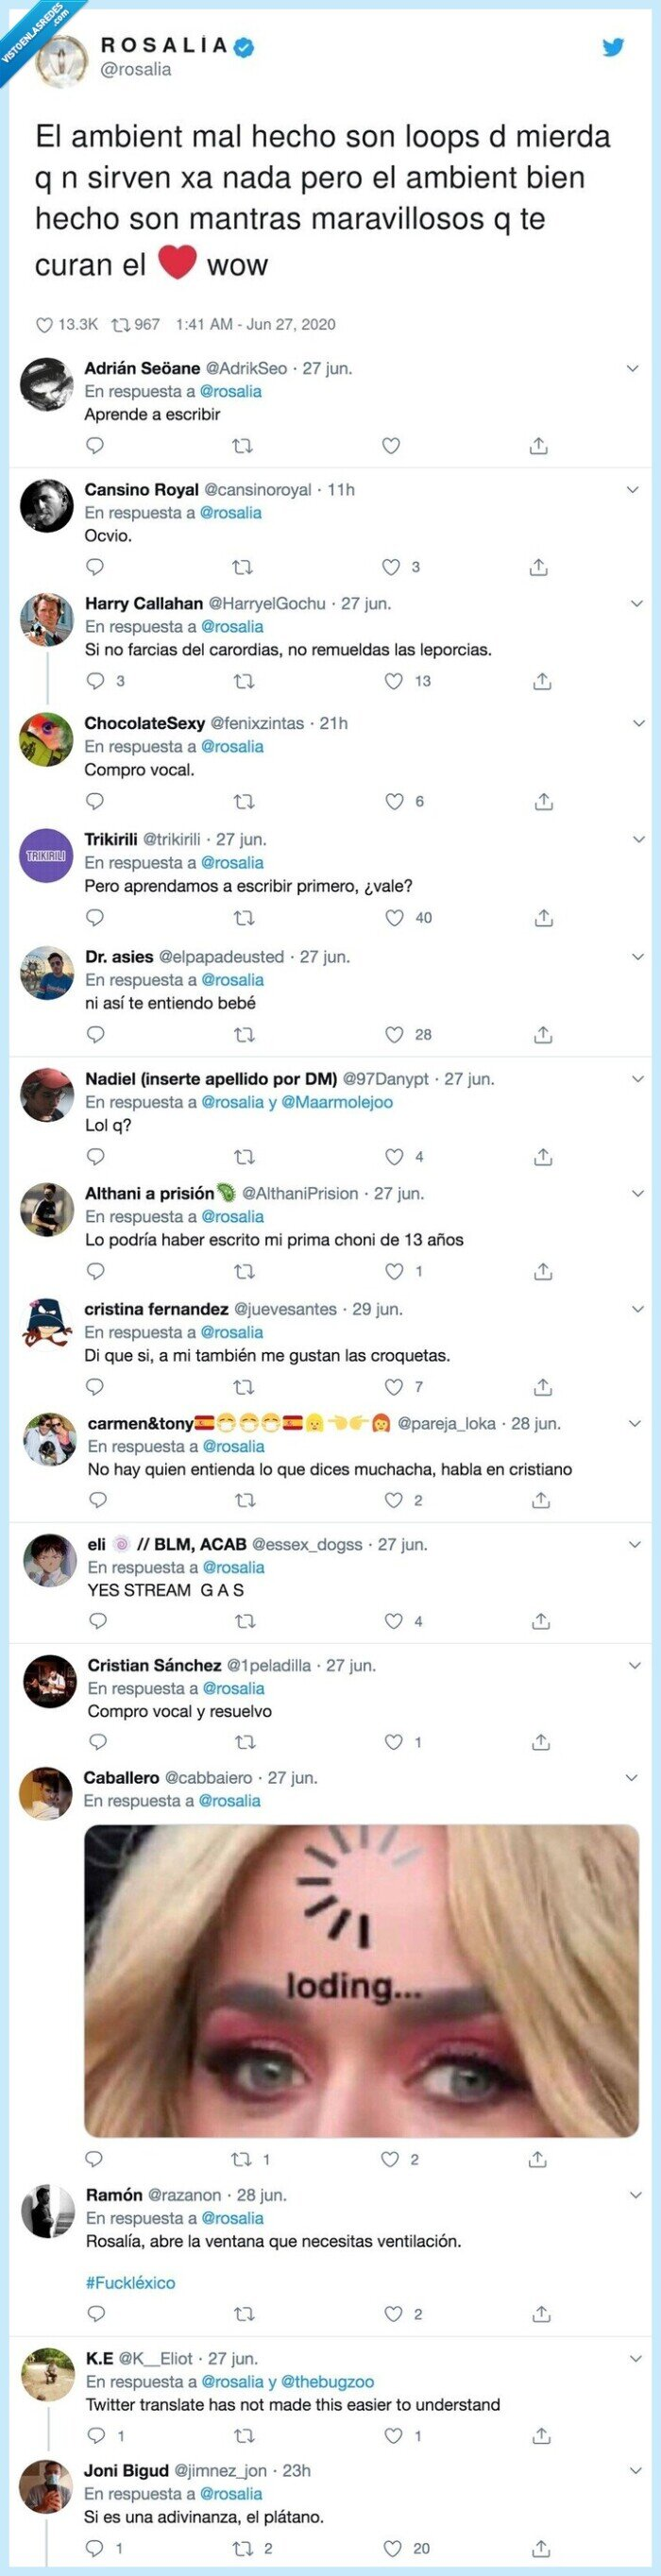 frase,rosalia,tweet,wtf